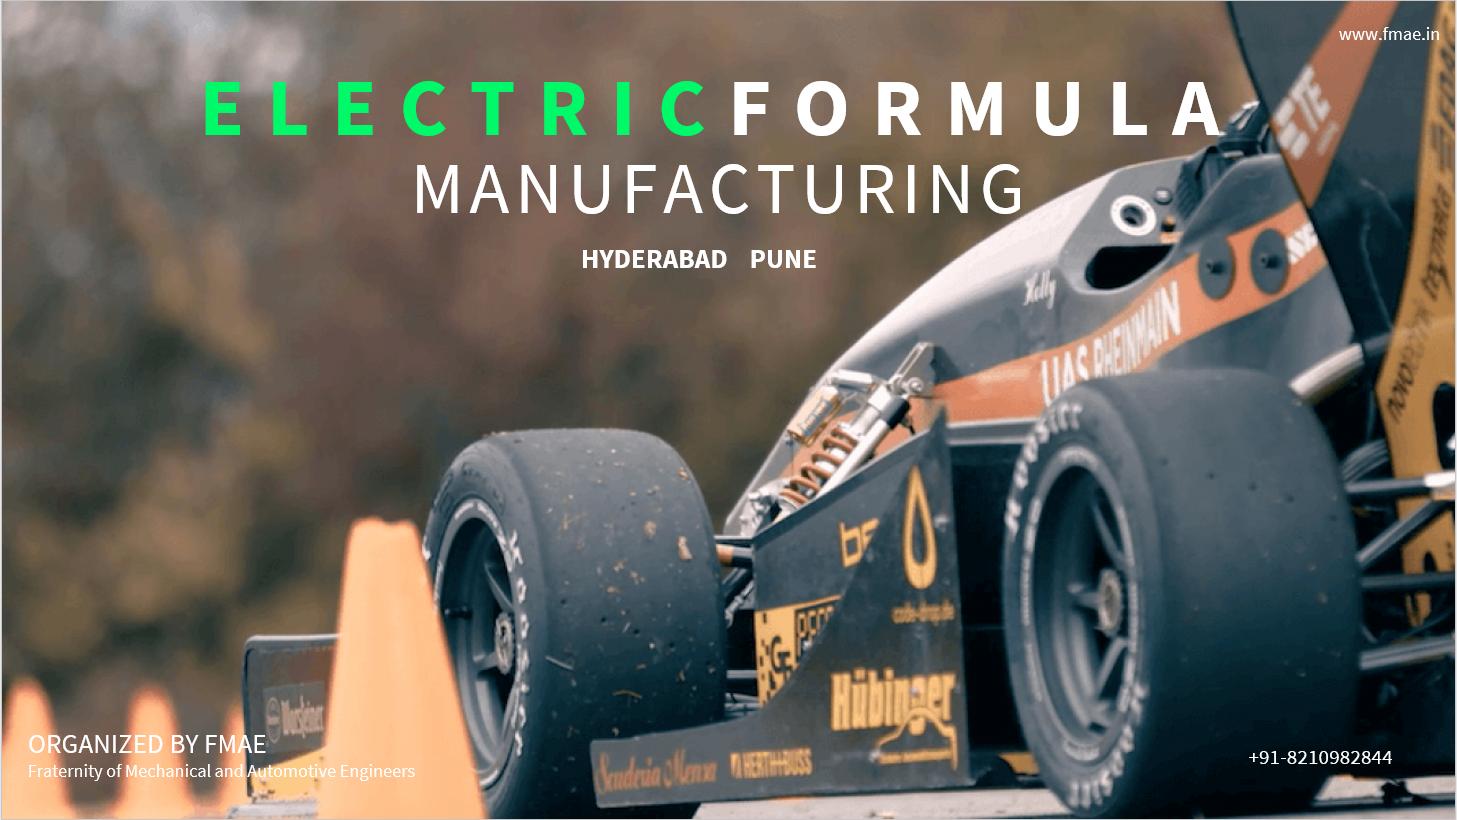 MANUFACTURING OF ELECTRIC FORMULA CAR